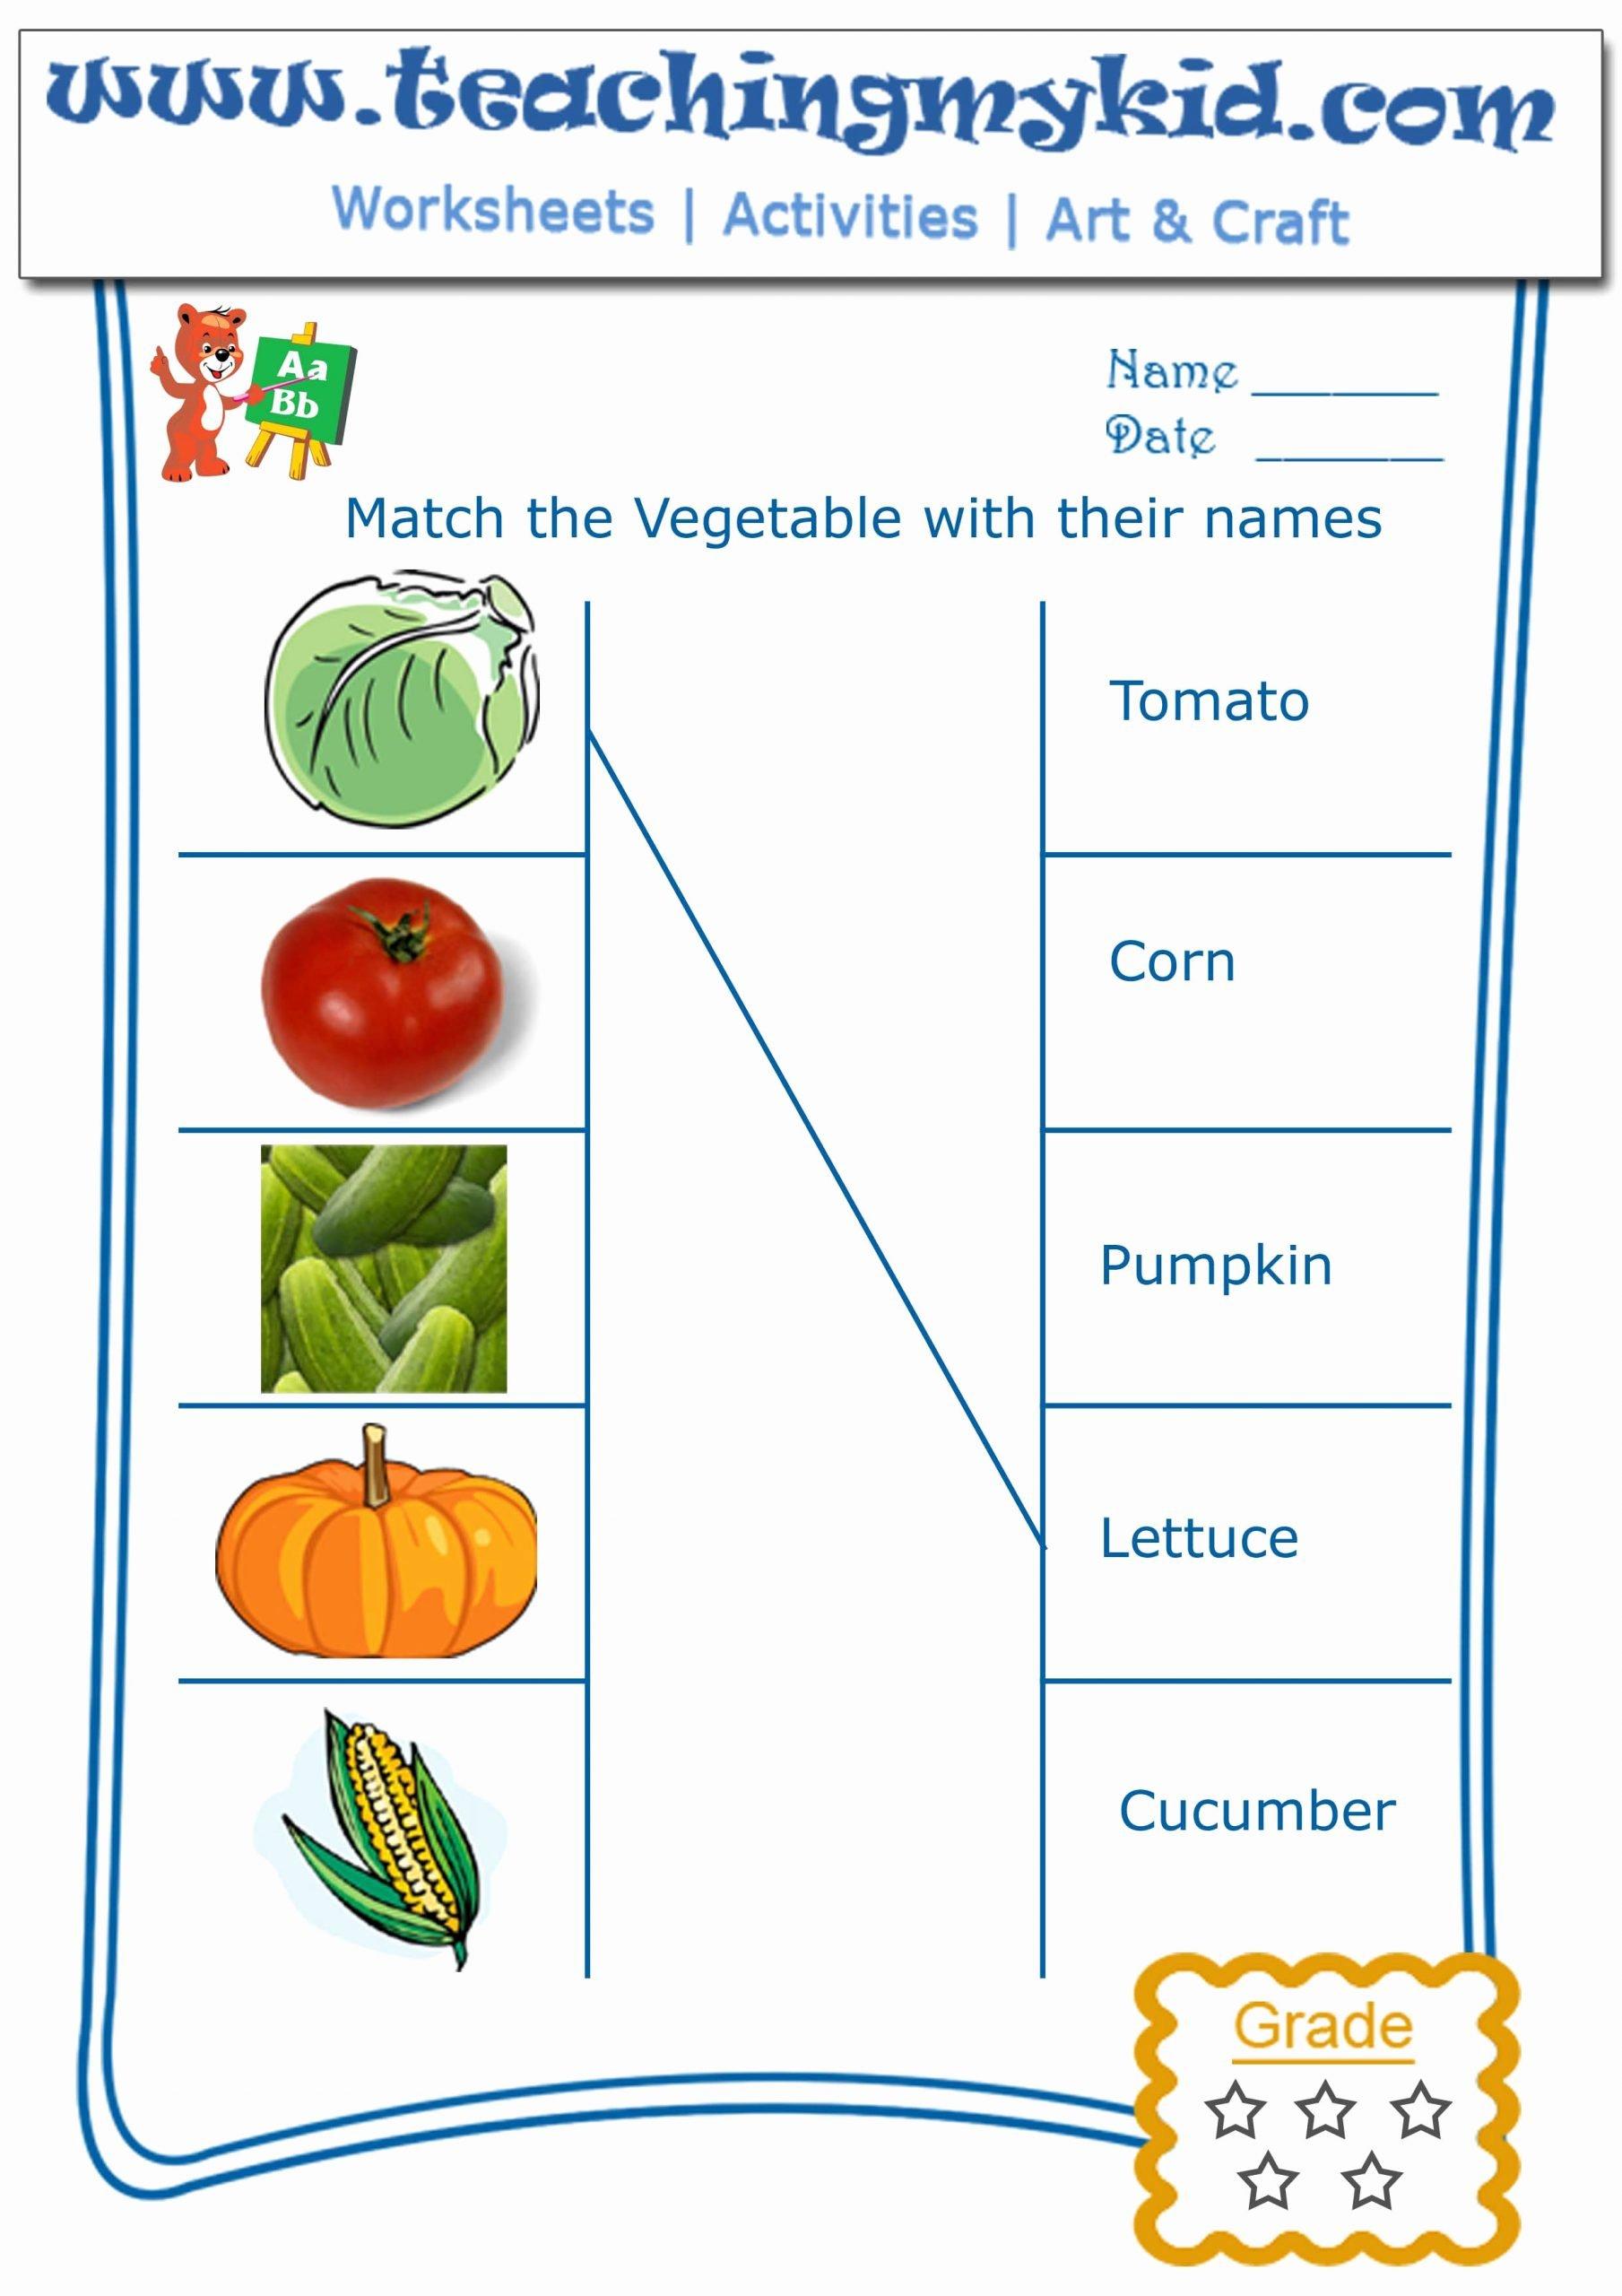 Vegetables Worksheets for Preschoolers Beautiful Kindergarten Worksheet Match Ve Ables with their Names 2